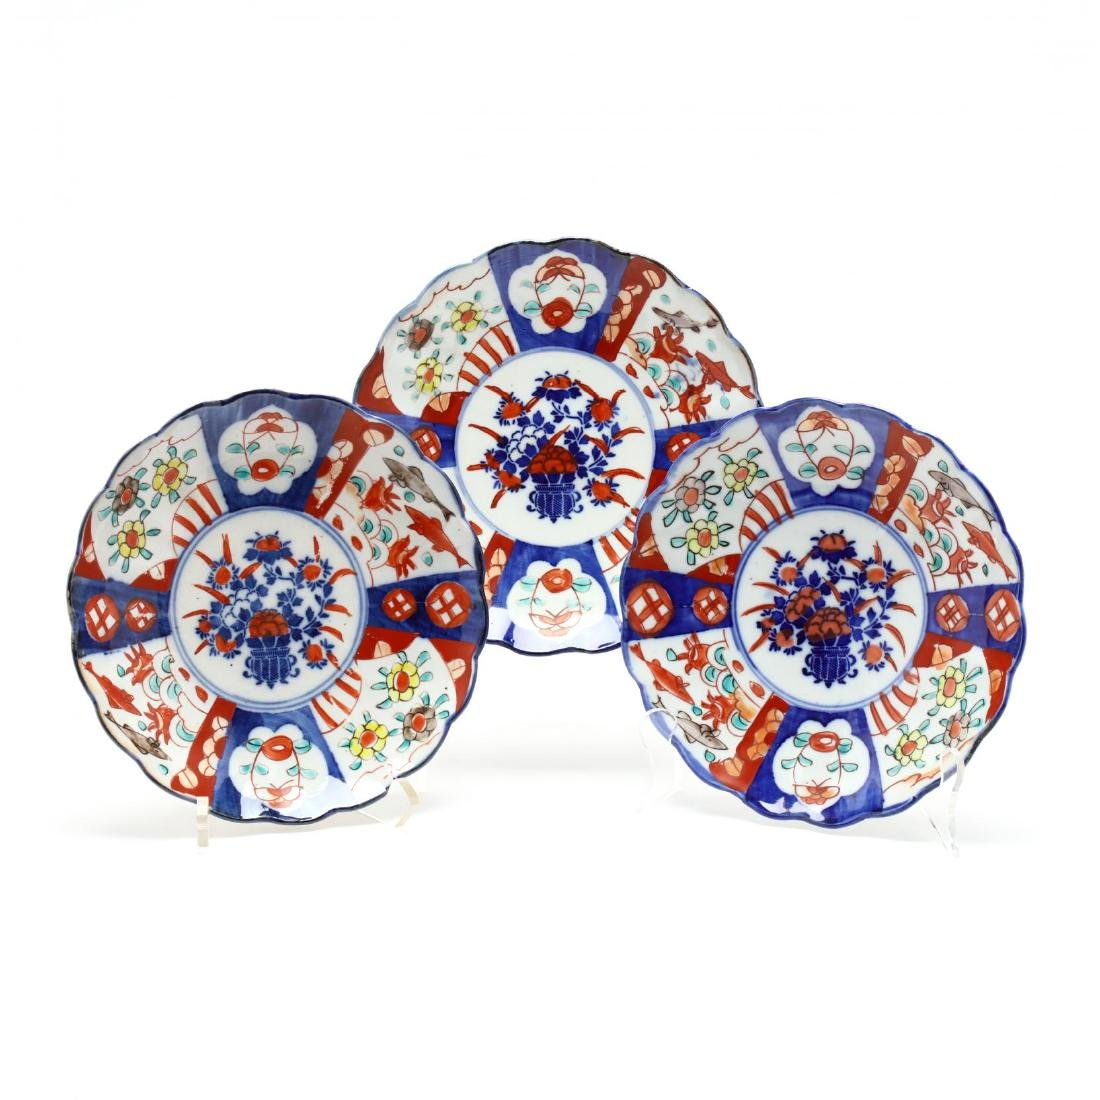 A Group of Imari Porcelain - 2